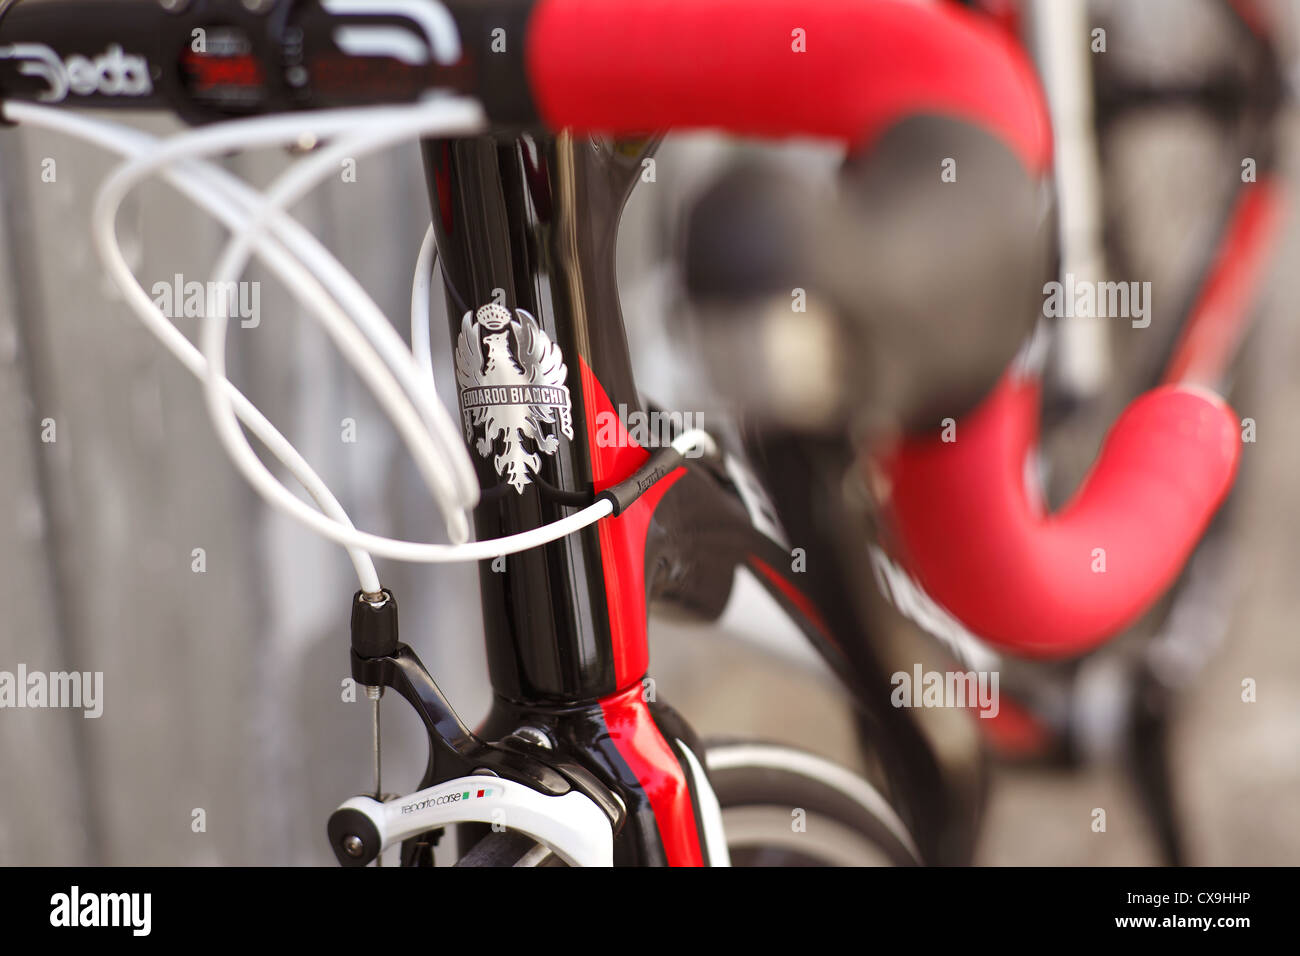 Bianchi Bicycle Stock Photos & Bianchi Bicycle Stock ...